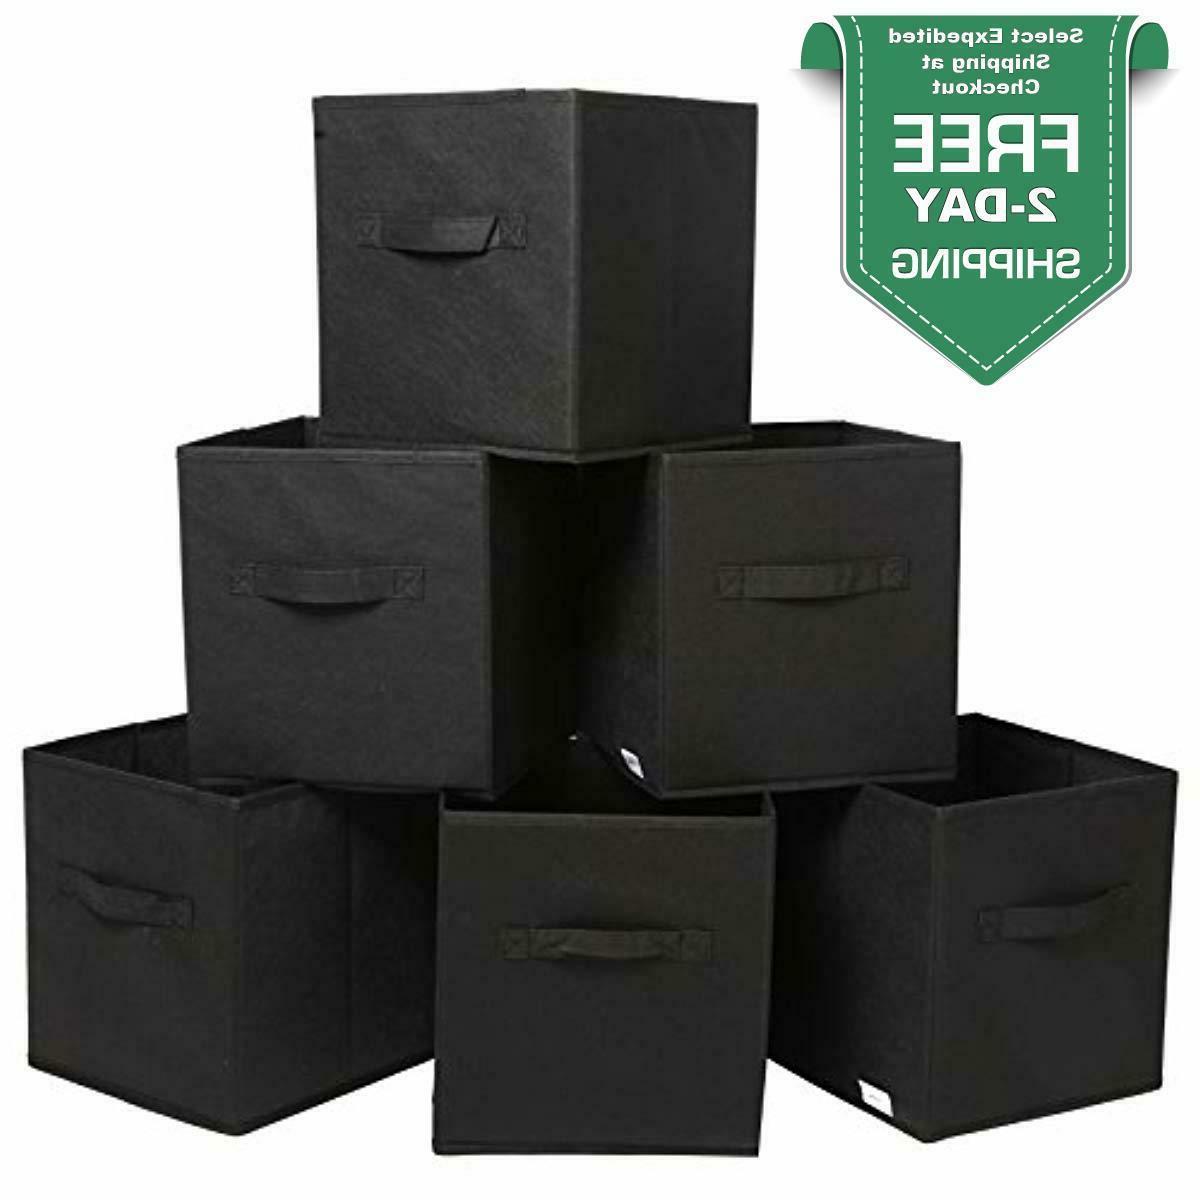 foldable storage cubes organizer basket box collapsible